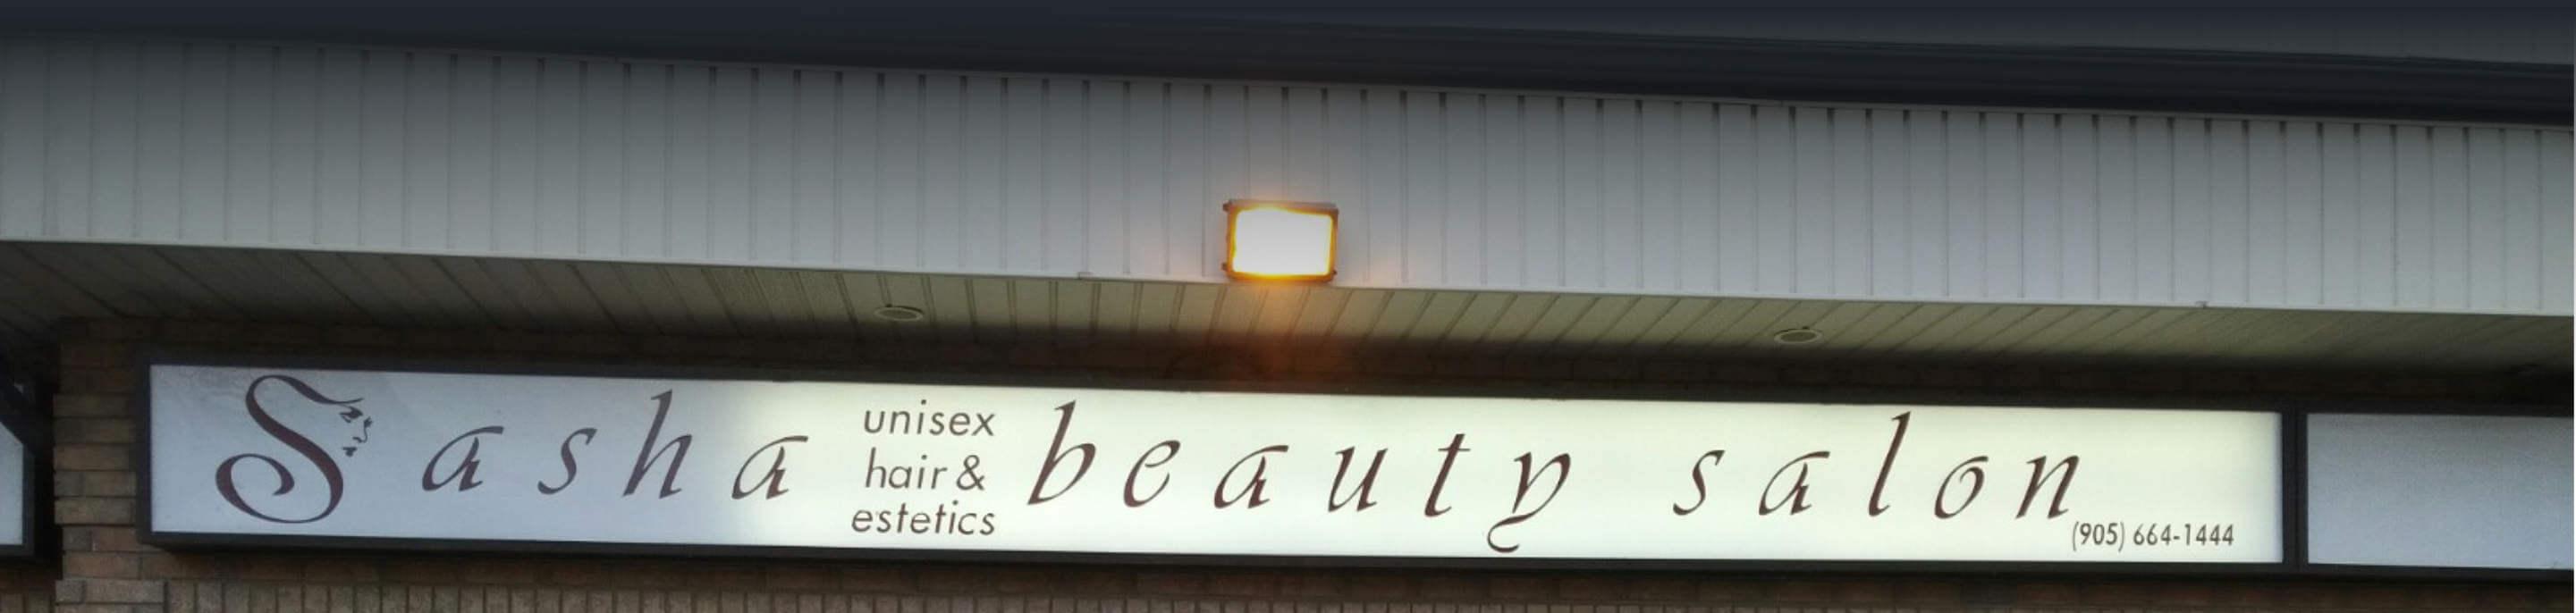 Sasha Salon: Unisex Hair and Aesthetics